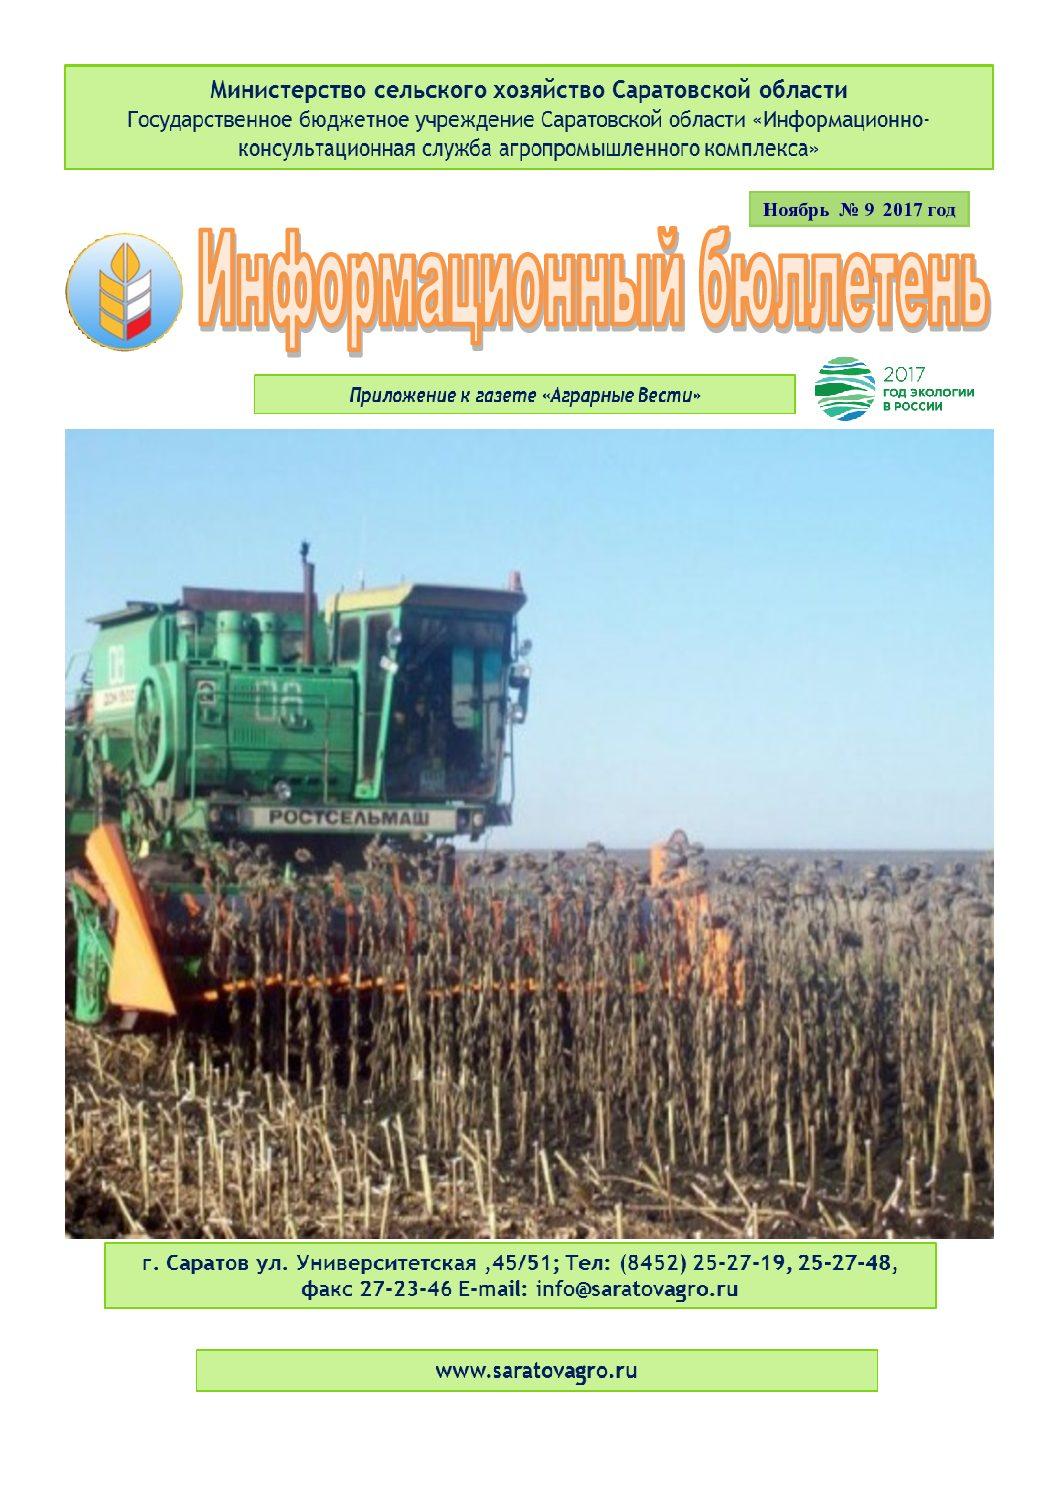 https://saratovagro.ru/wp-content/uploads/2020/08/9.2017-pdf.jpg